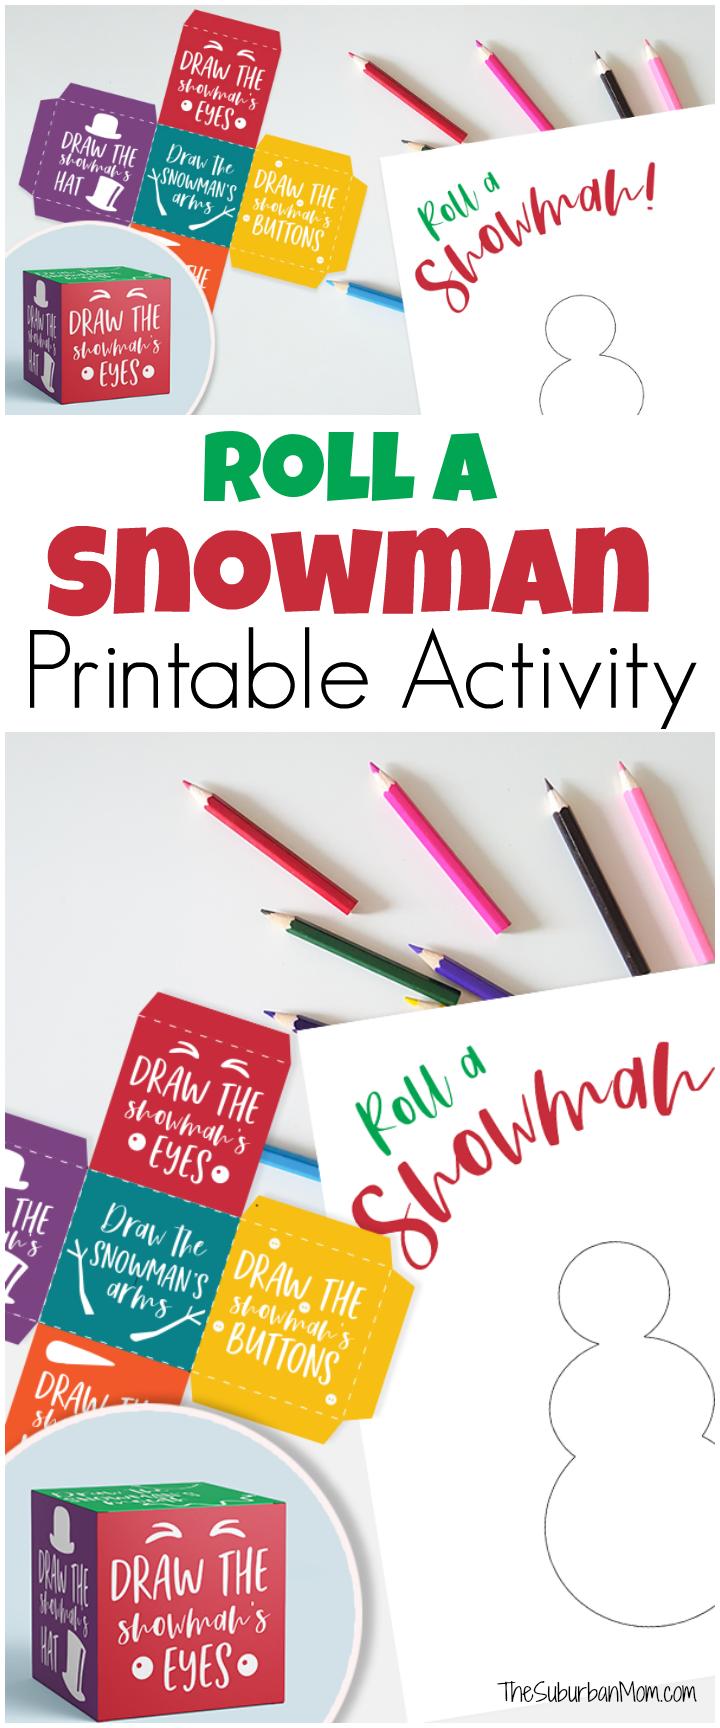 Roll A Snowman Printable Activity